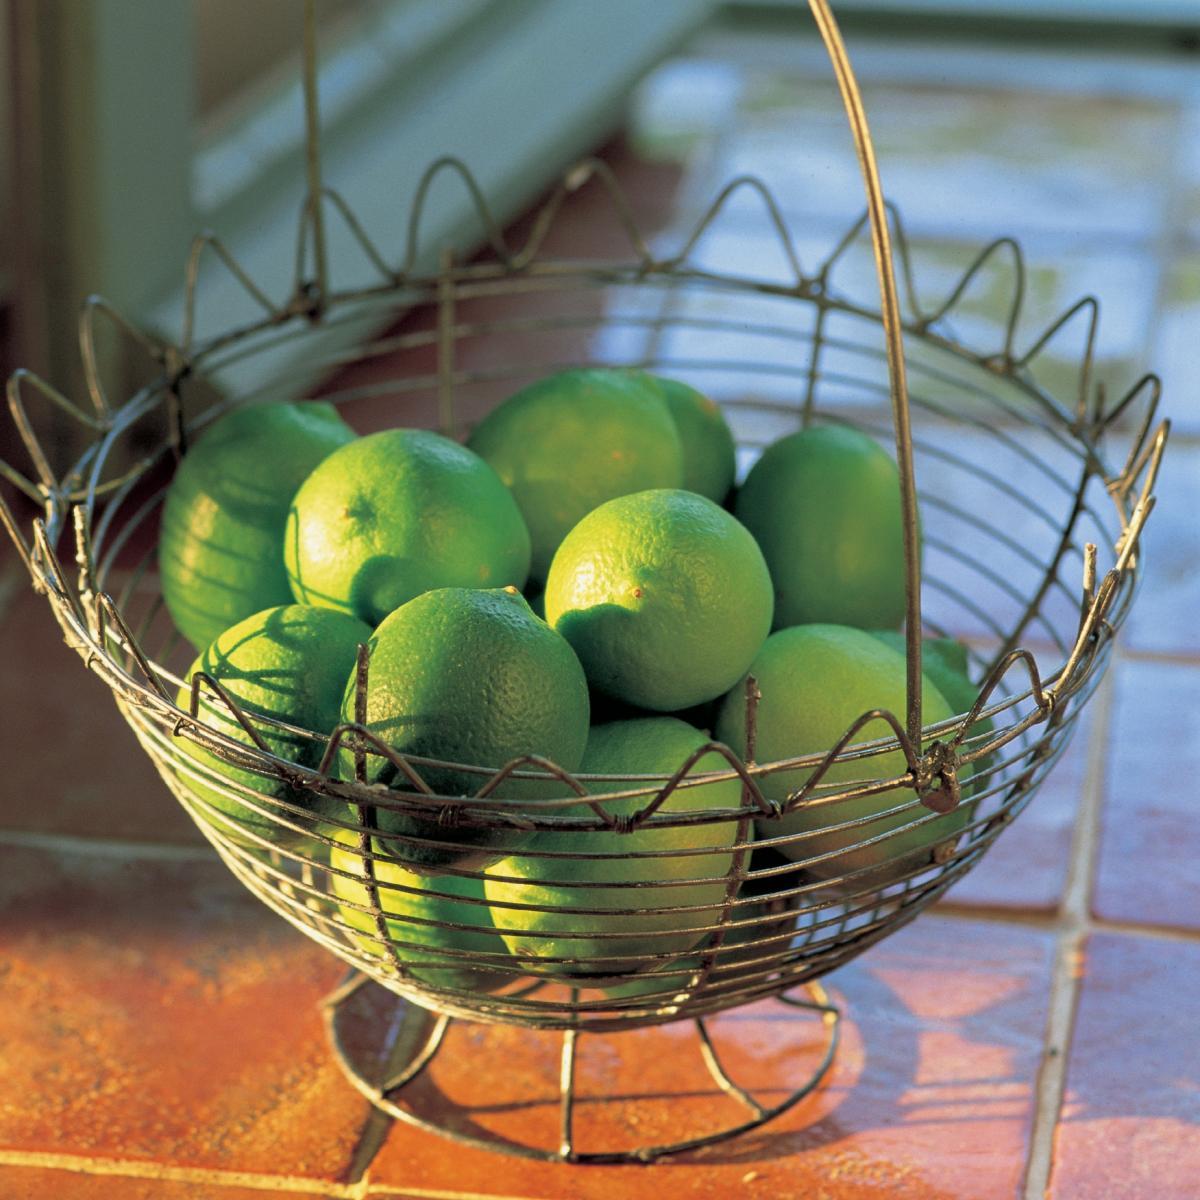 Ingredient vegetarian limes